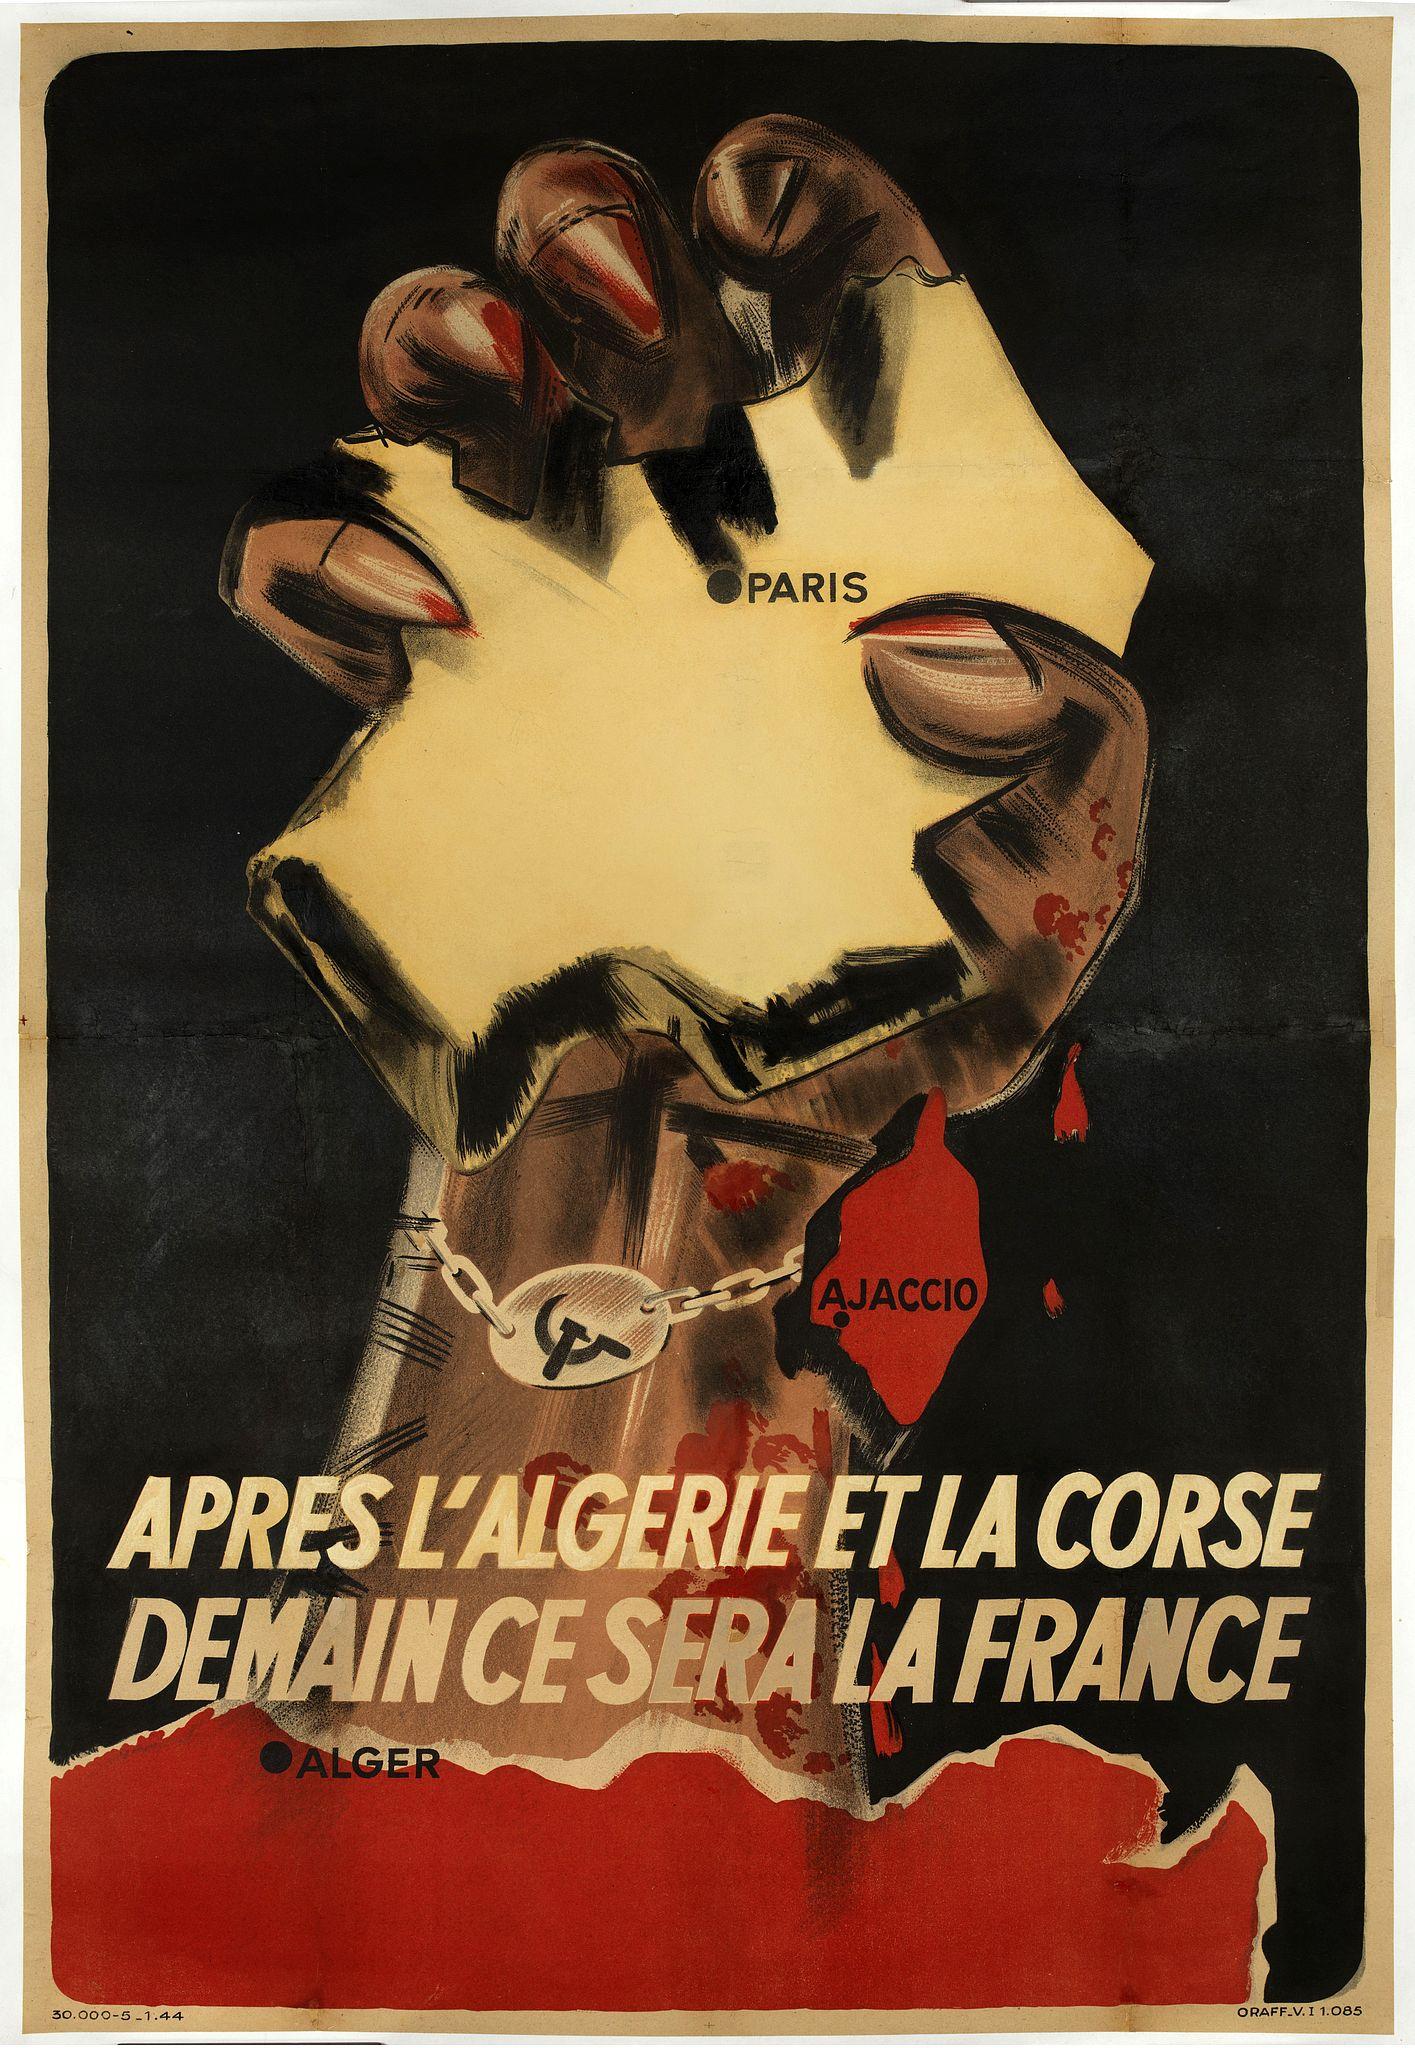 ORAFF -  Après l'Algérie et la Corse Demain se sera la France.